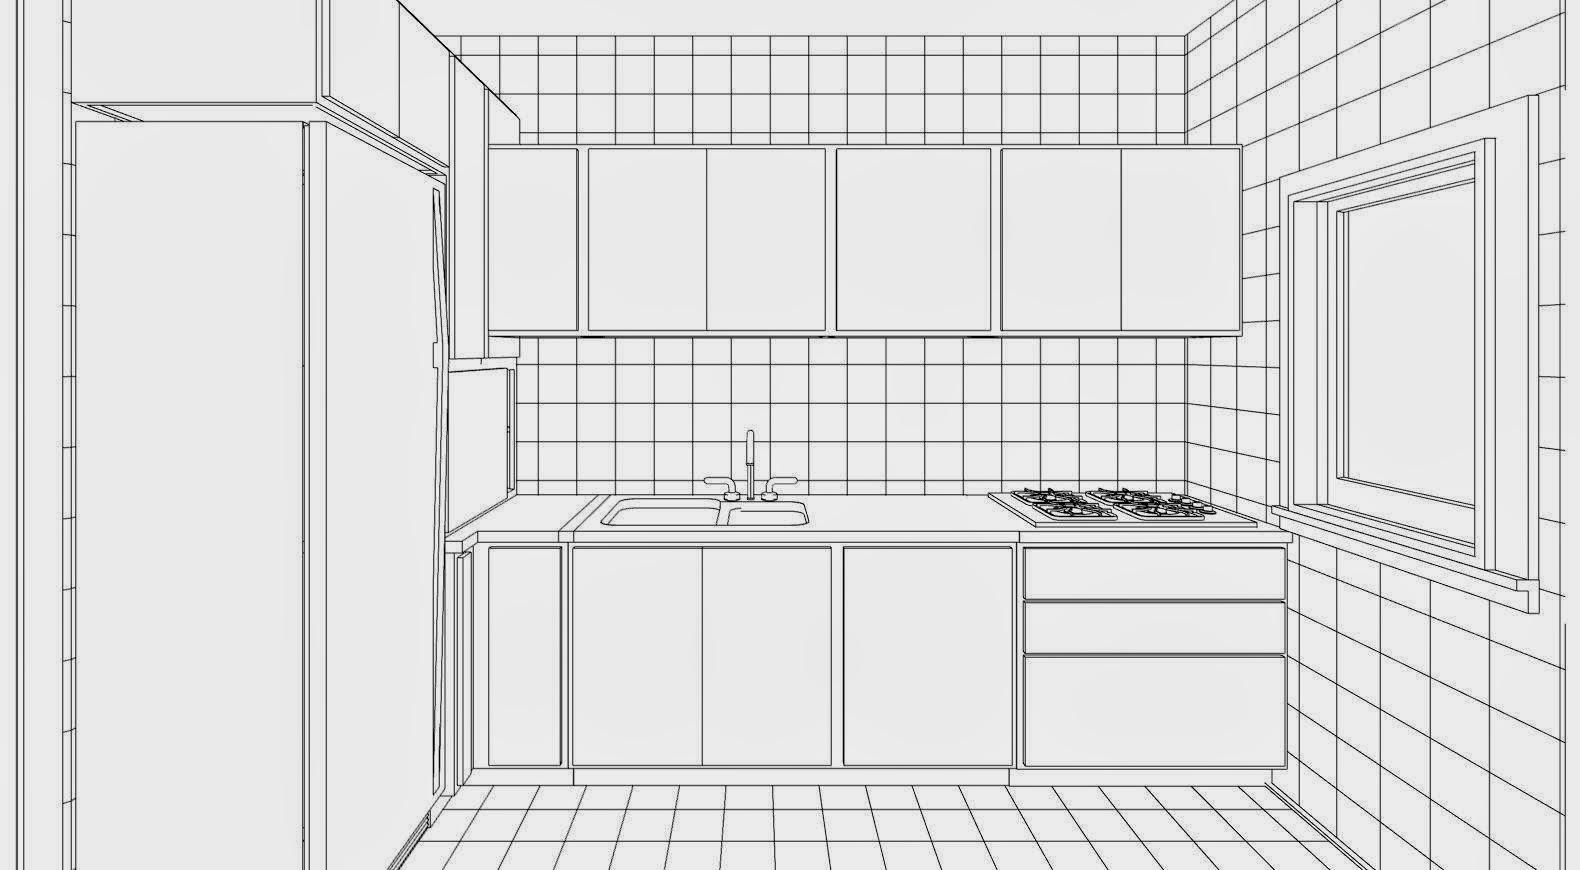 Disegno cucina angolare gt48 regardsdefemmes for Disegnare online 3d